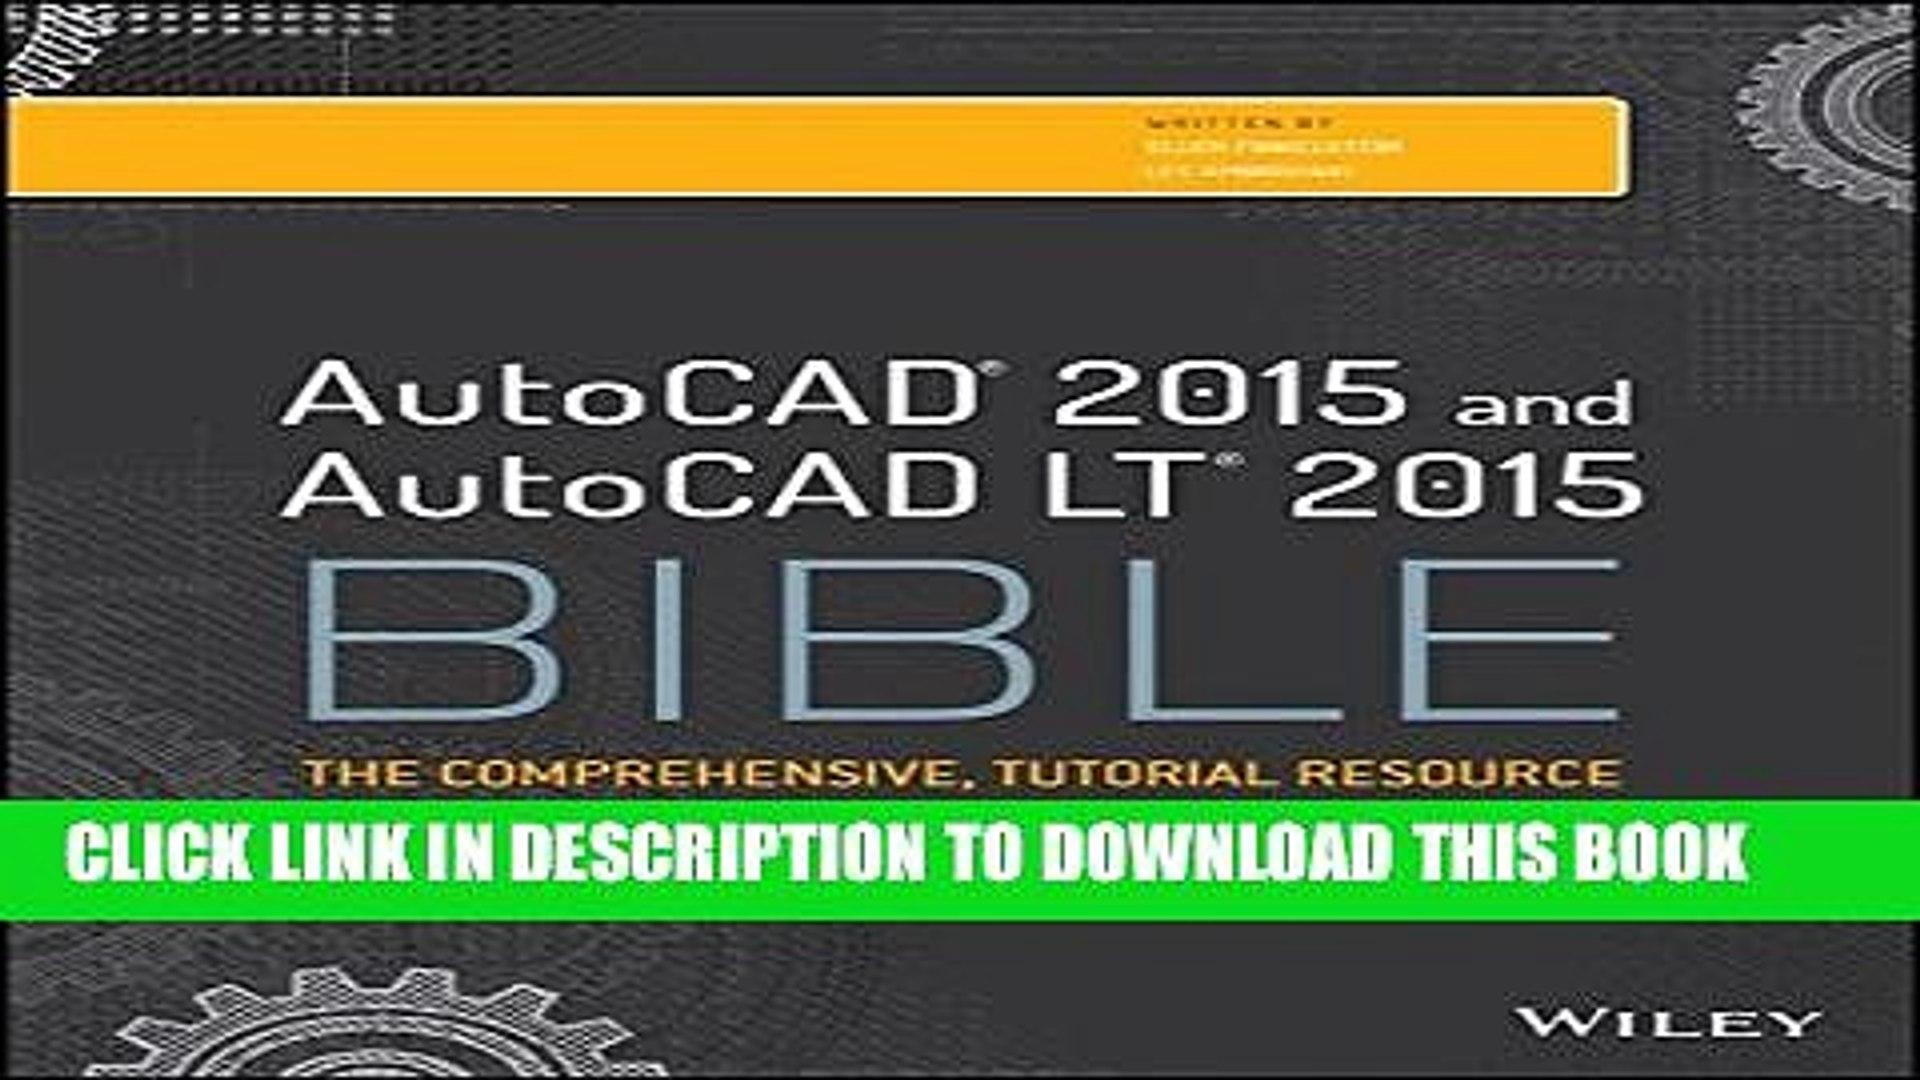 autocad 2015 bible pdf free download